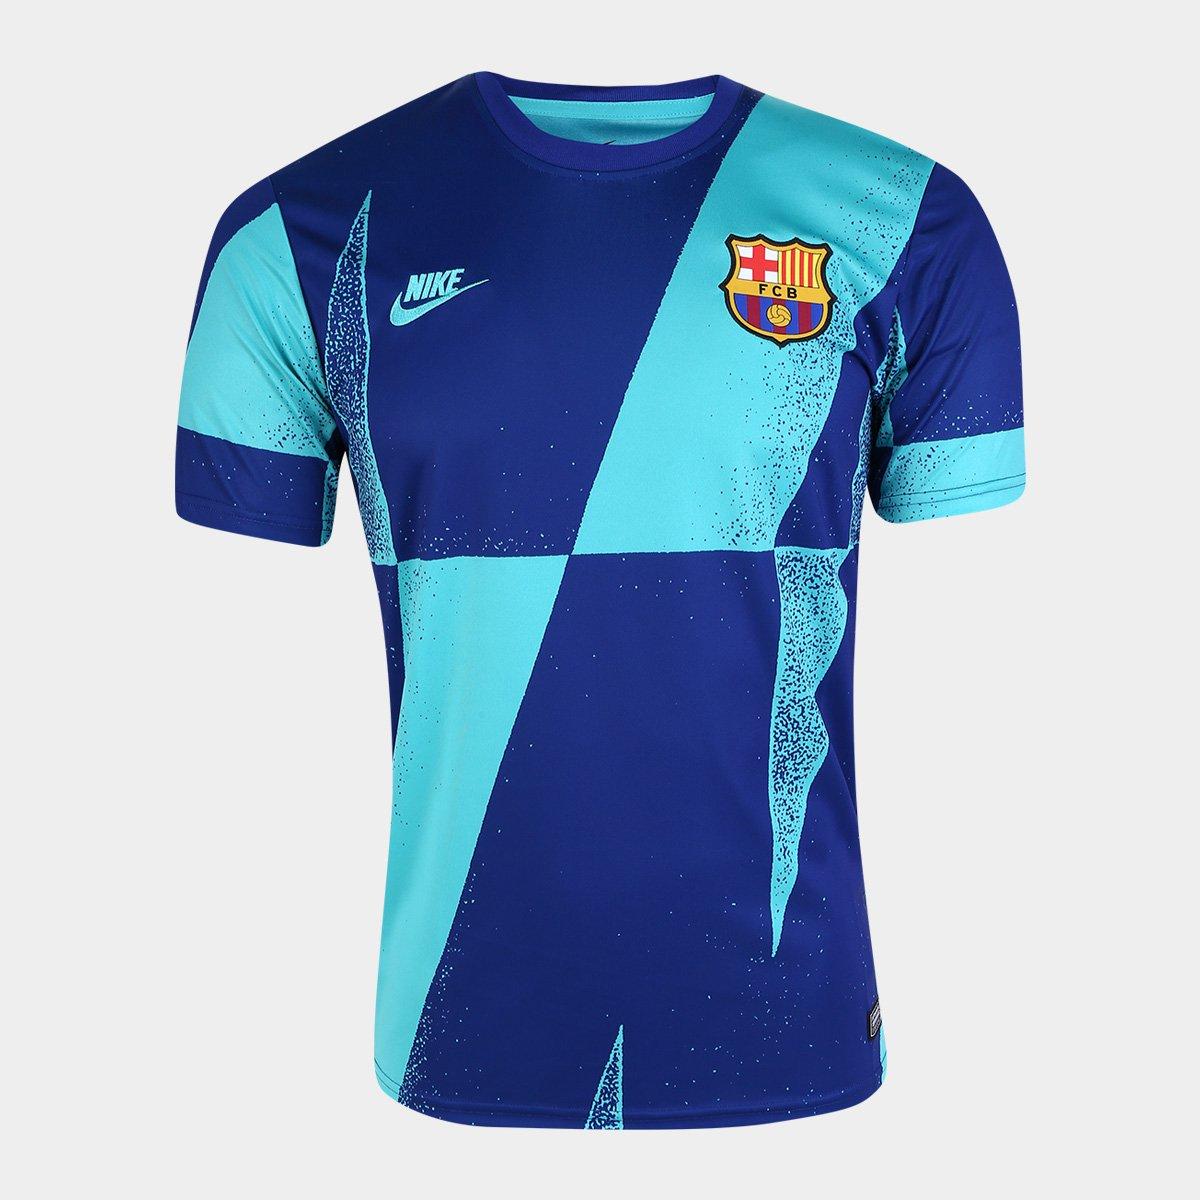 descuento de venta caliente envio GRATIS a todo el mundo moderno y elegante en moda Camisa Barcelona Nike Dry SS Masculina - Azul Royal